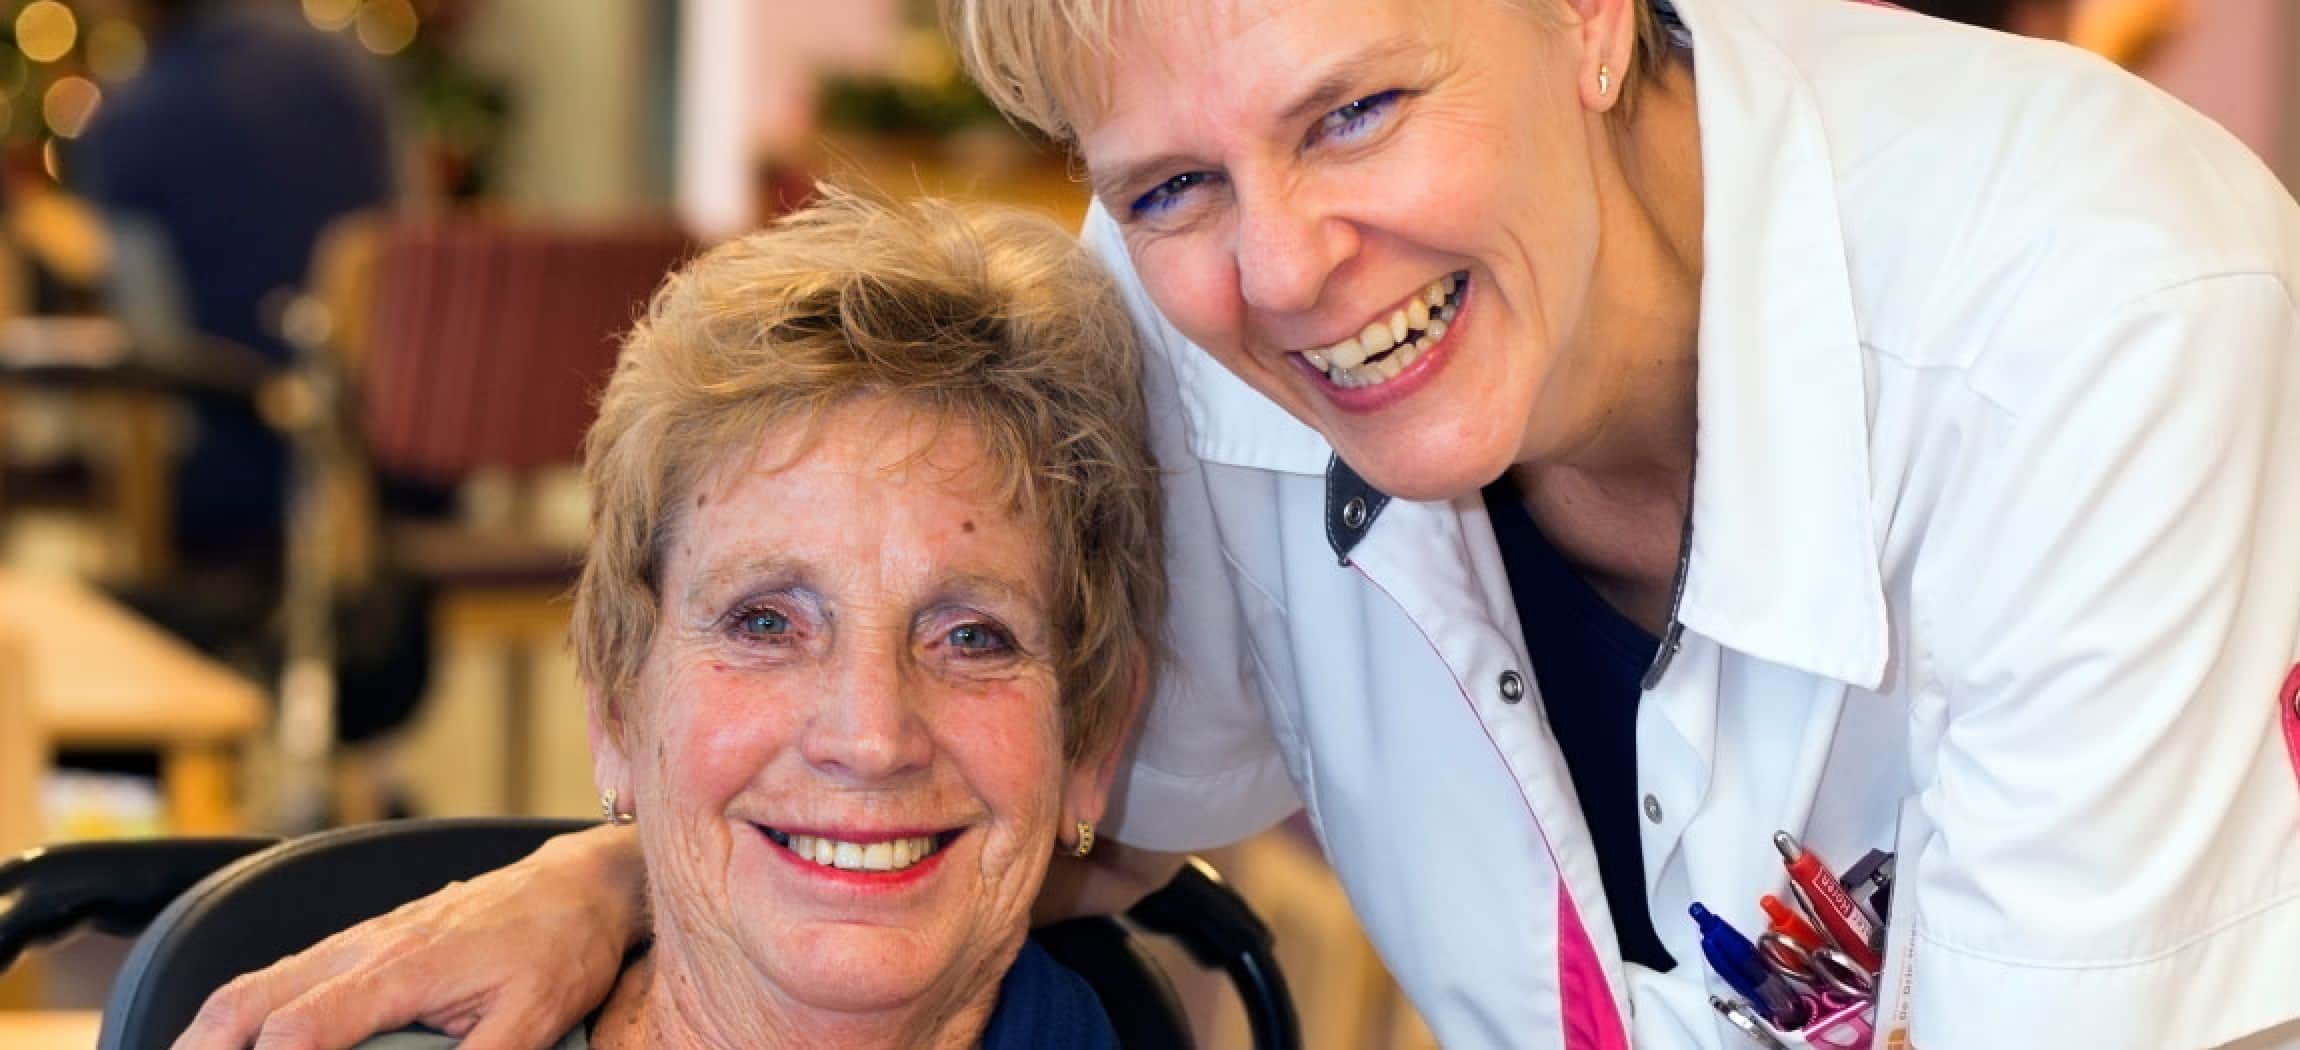 Lachende verpleegkundige omarmt oudere vrouw